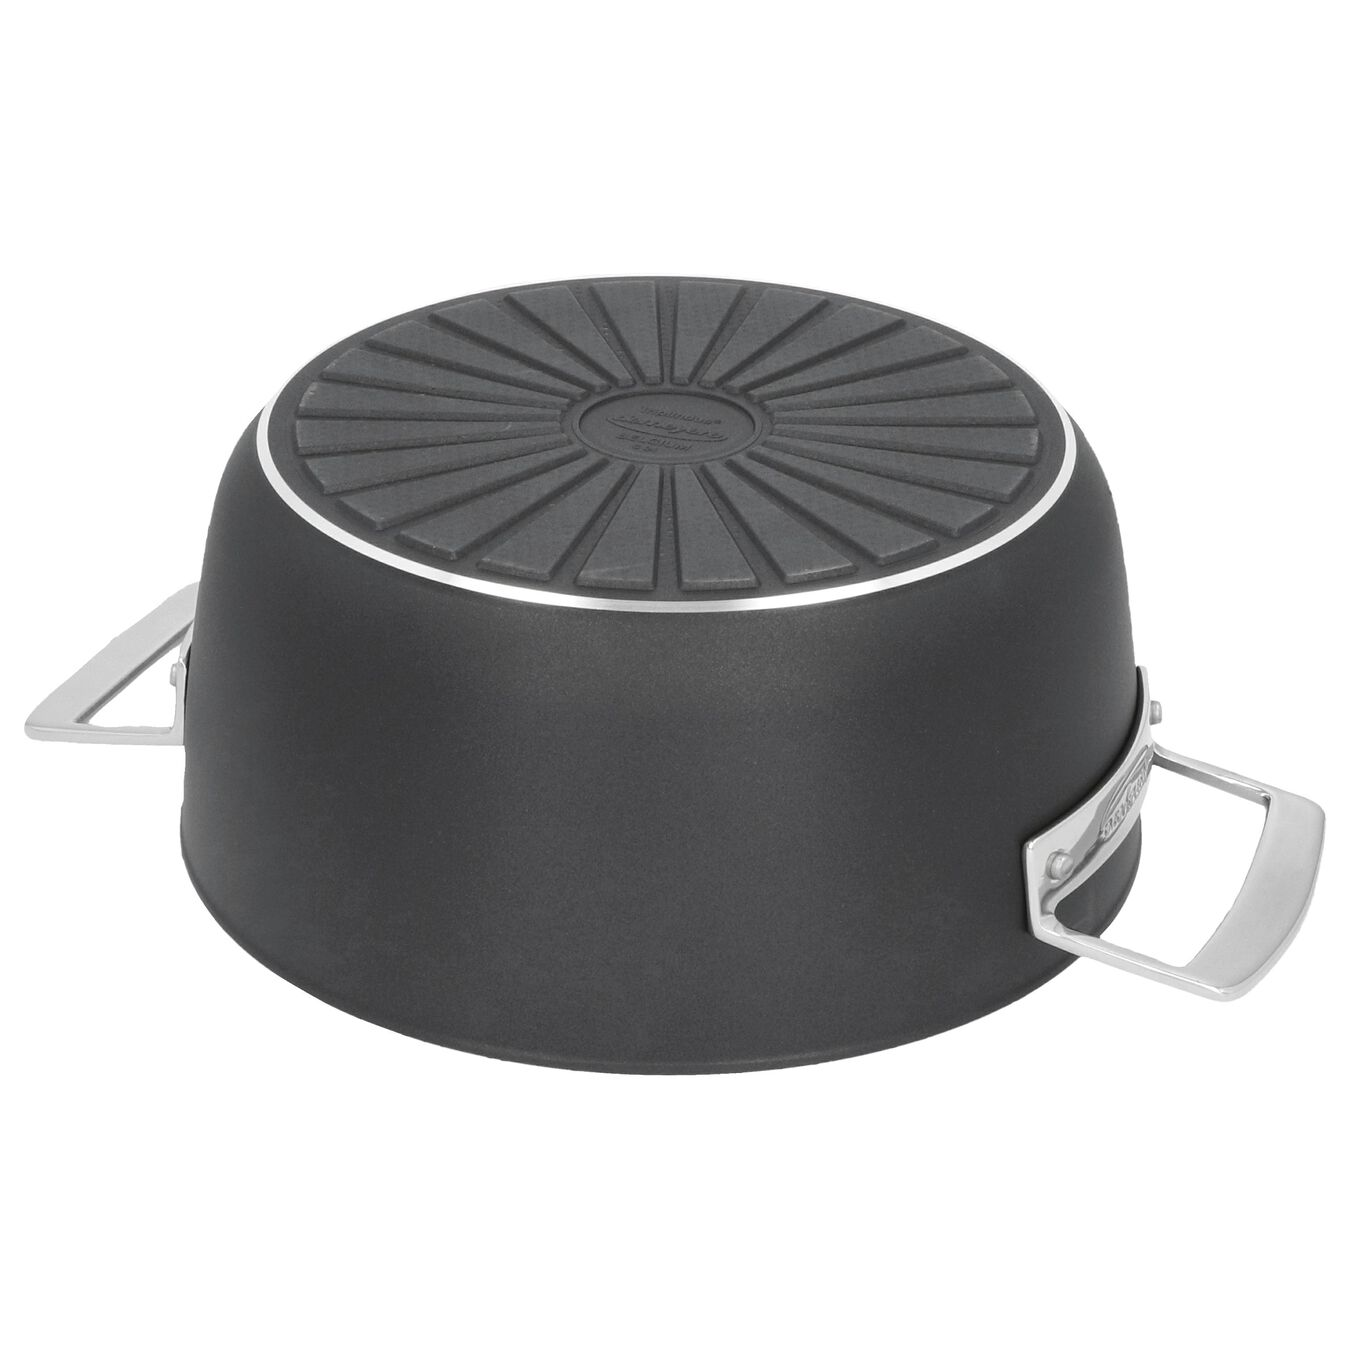 4.5 qt, aluminium, Nonstick Dutch Oven,,large 2